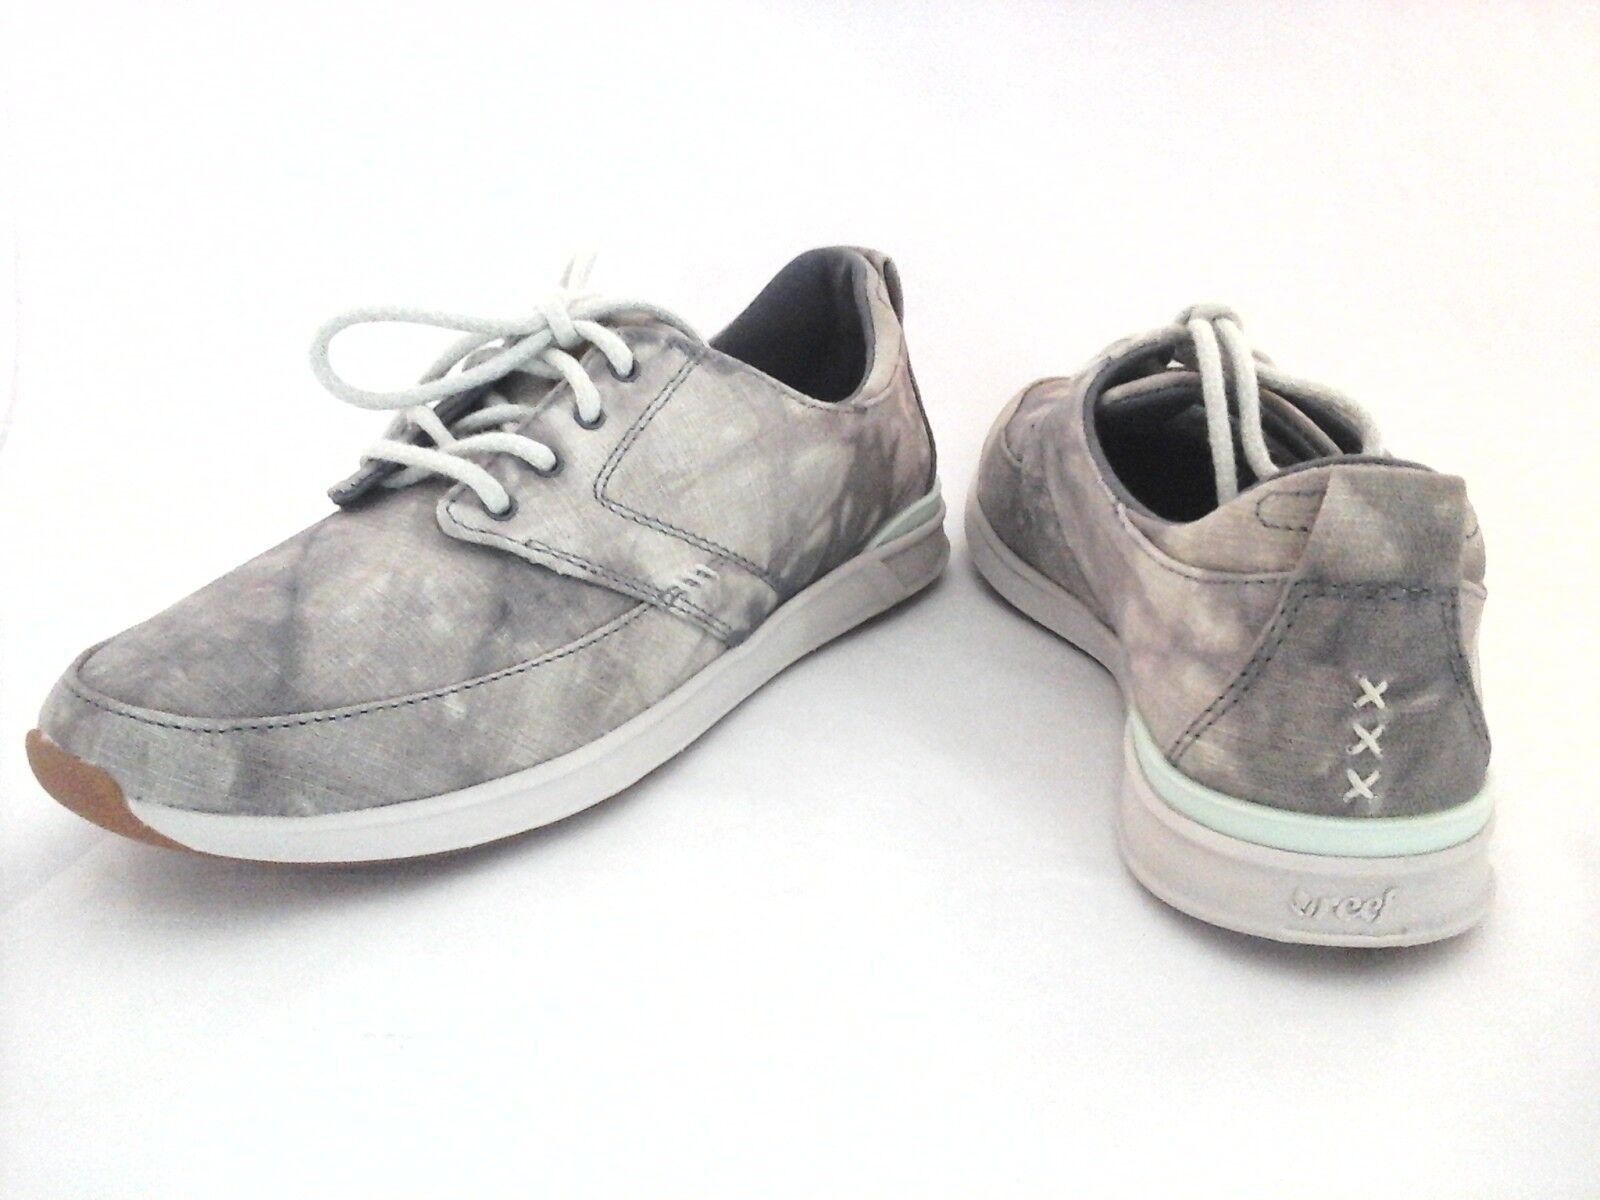 Reef Rover basse Texas Women's gris/crème camouflage/tie dye Décontracté Baskets Chaussures New